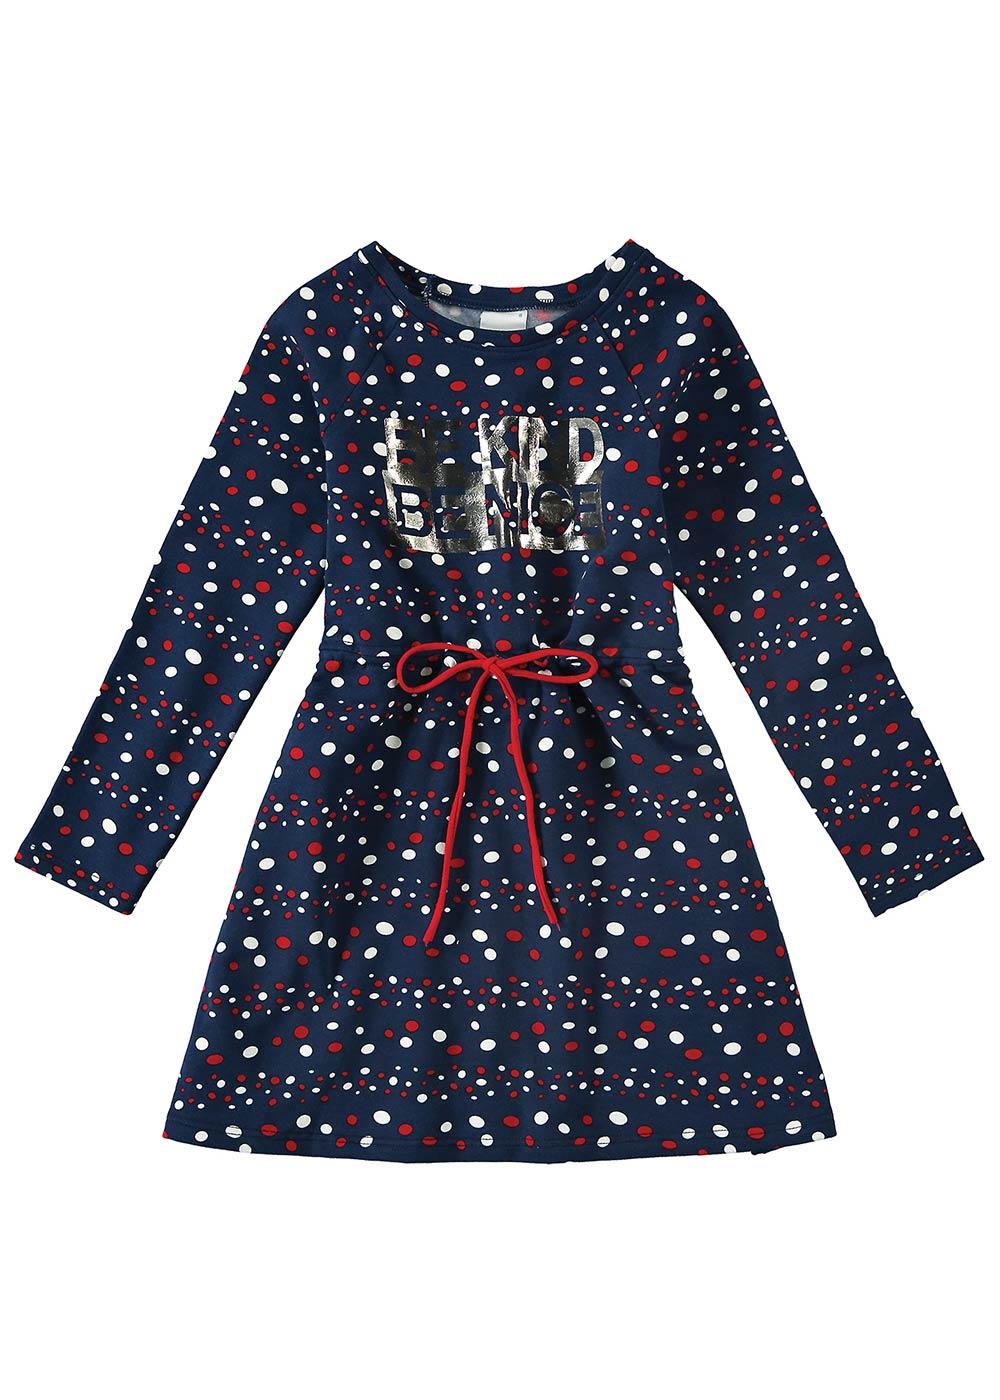 Vestido Inverno Infantil Feminino Azul Marinho Be Nice - Malwee